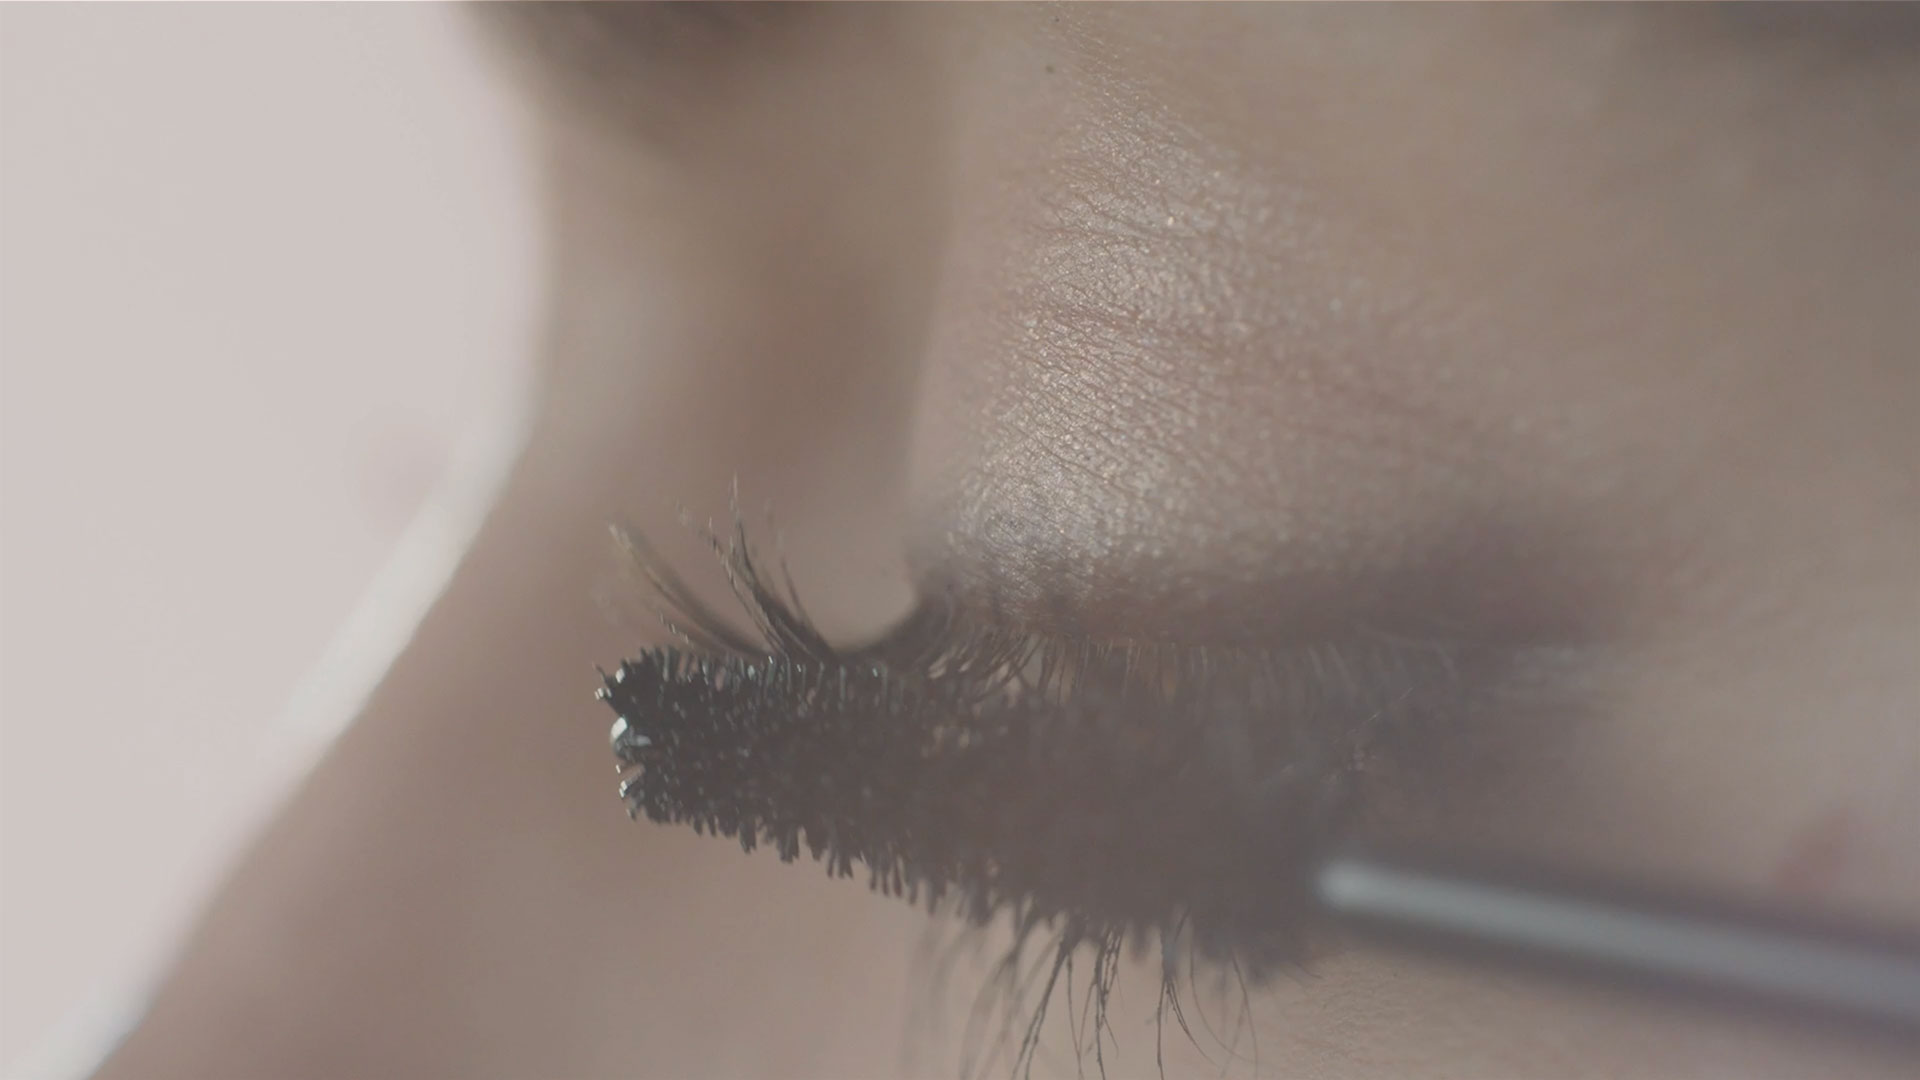 NEW: The Inifinite Lash Mascara